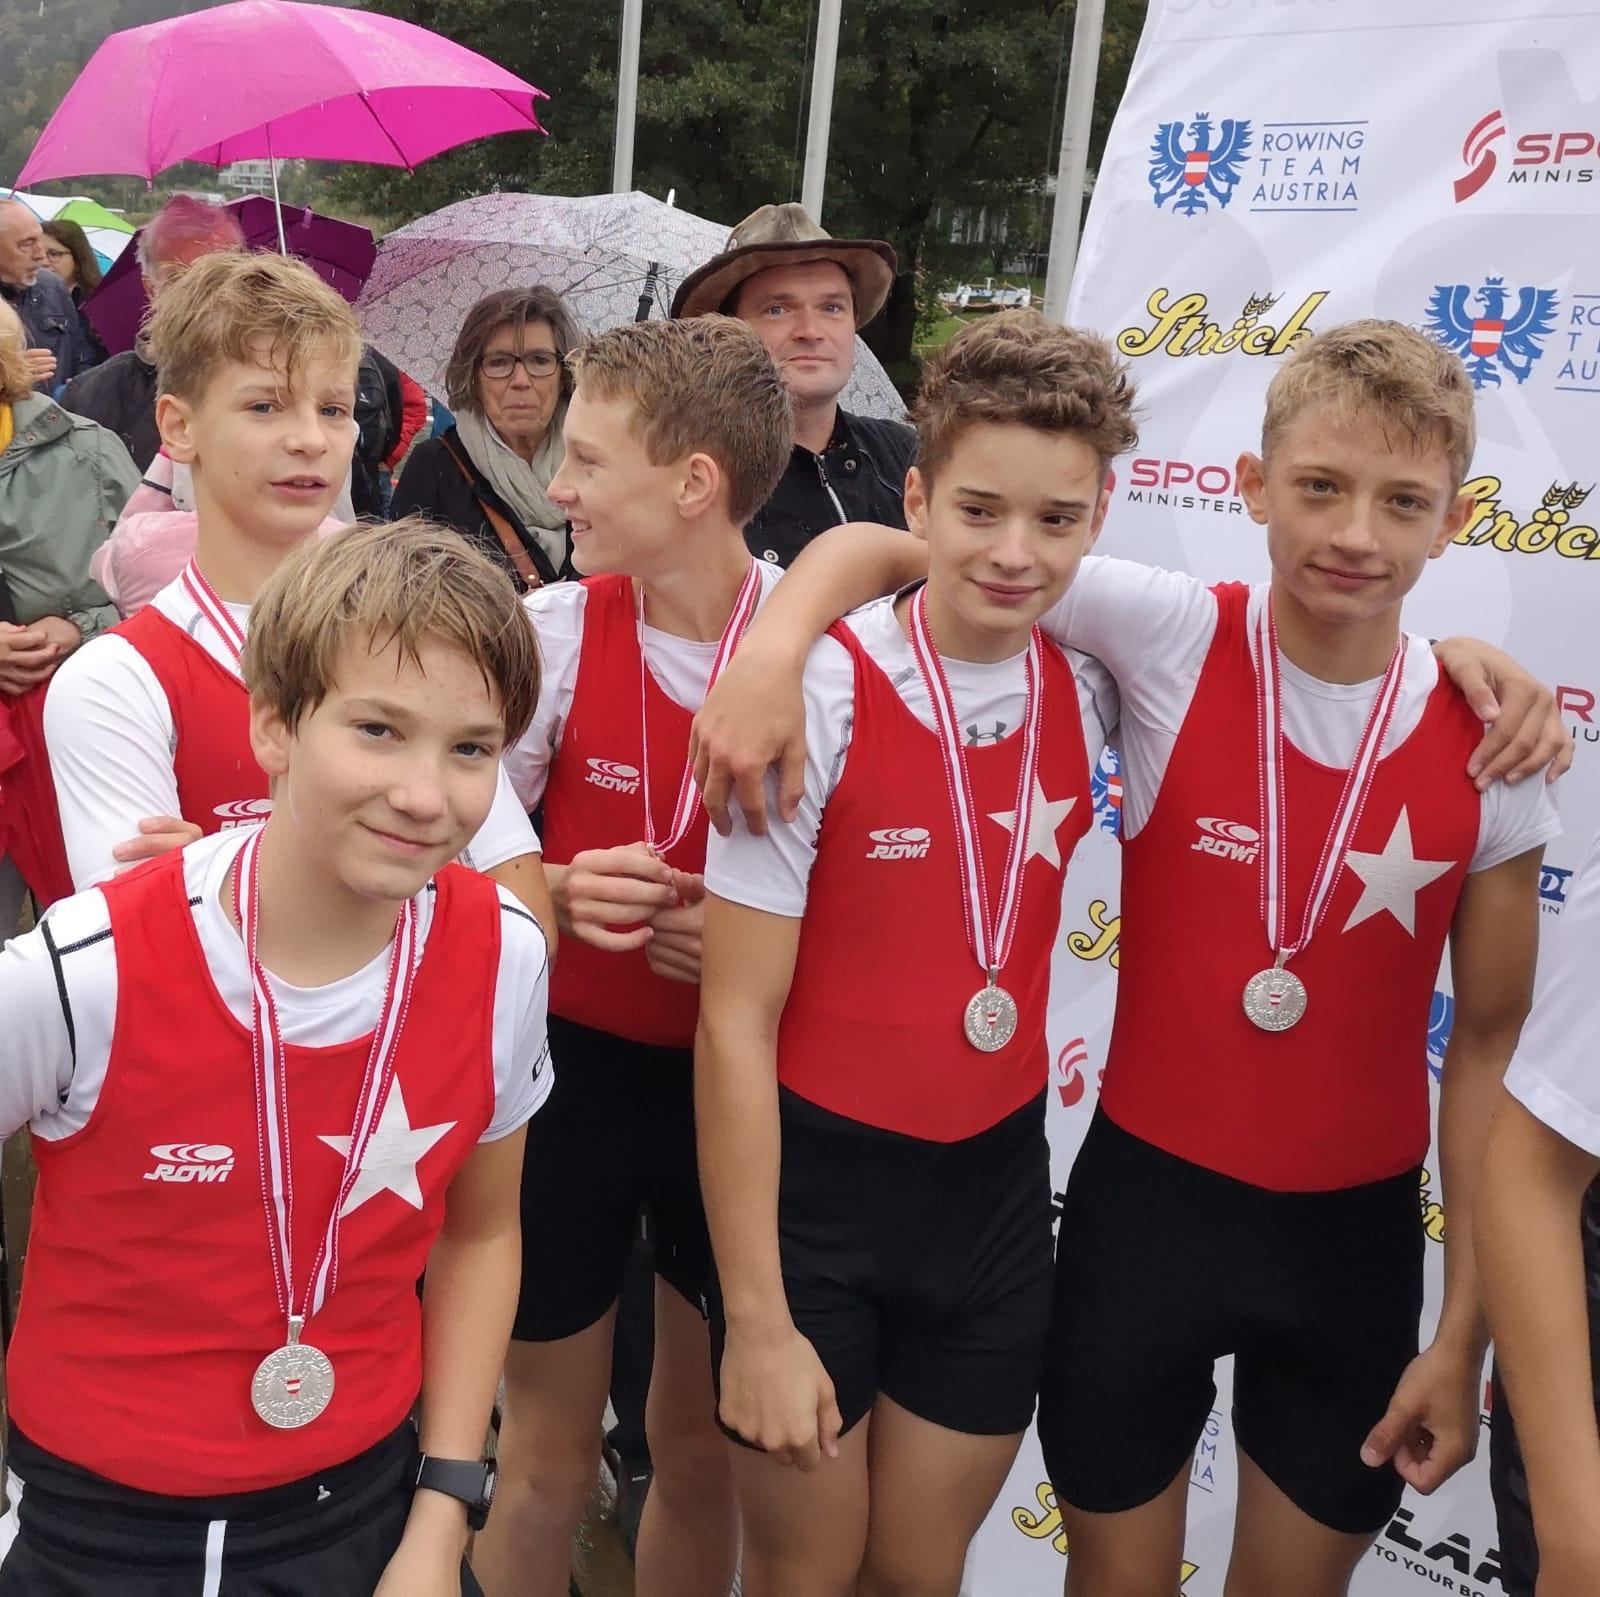 ÖM 2018 Ossiachersee | Luca Darnhofer, Ulli und Leo Oswald, Paul Mikosch, Stm: Florian Staniszewski